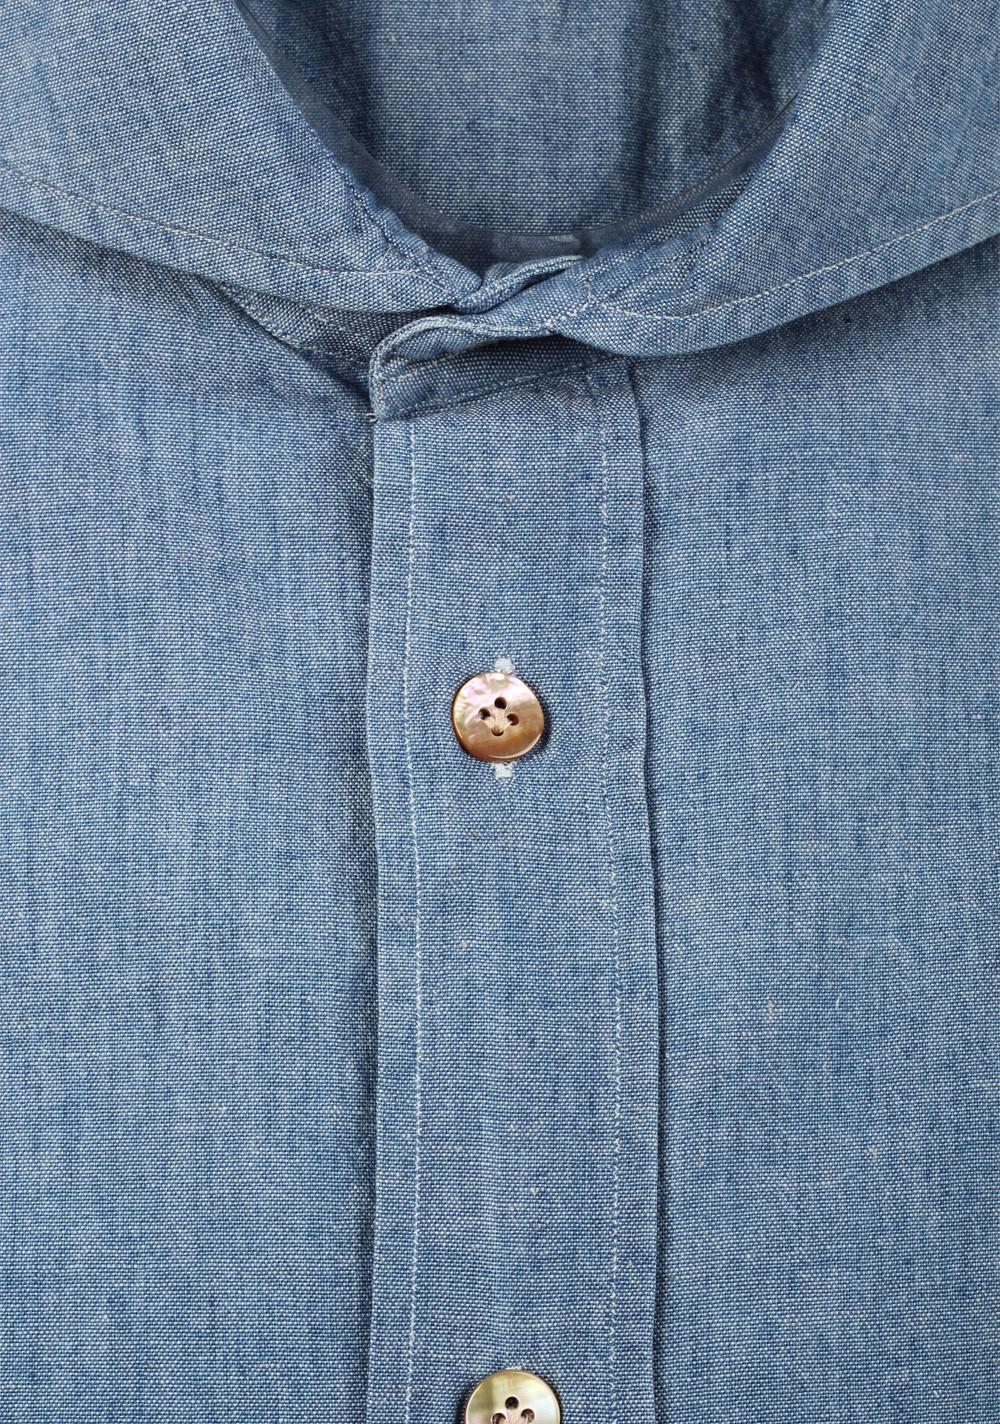 Mazzarelli Denim Shirt Size 42 / 16,5 U.S. In Cotton   Costume Limité